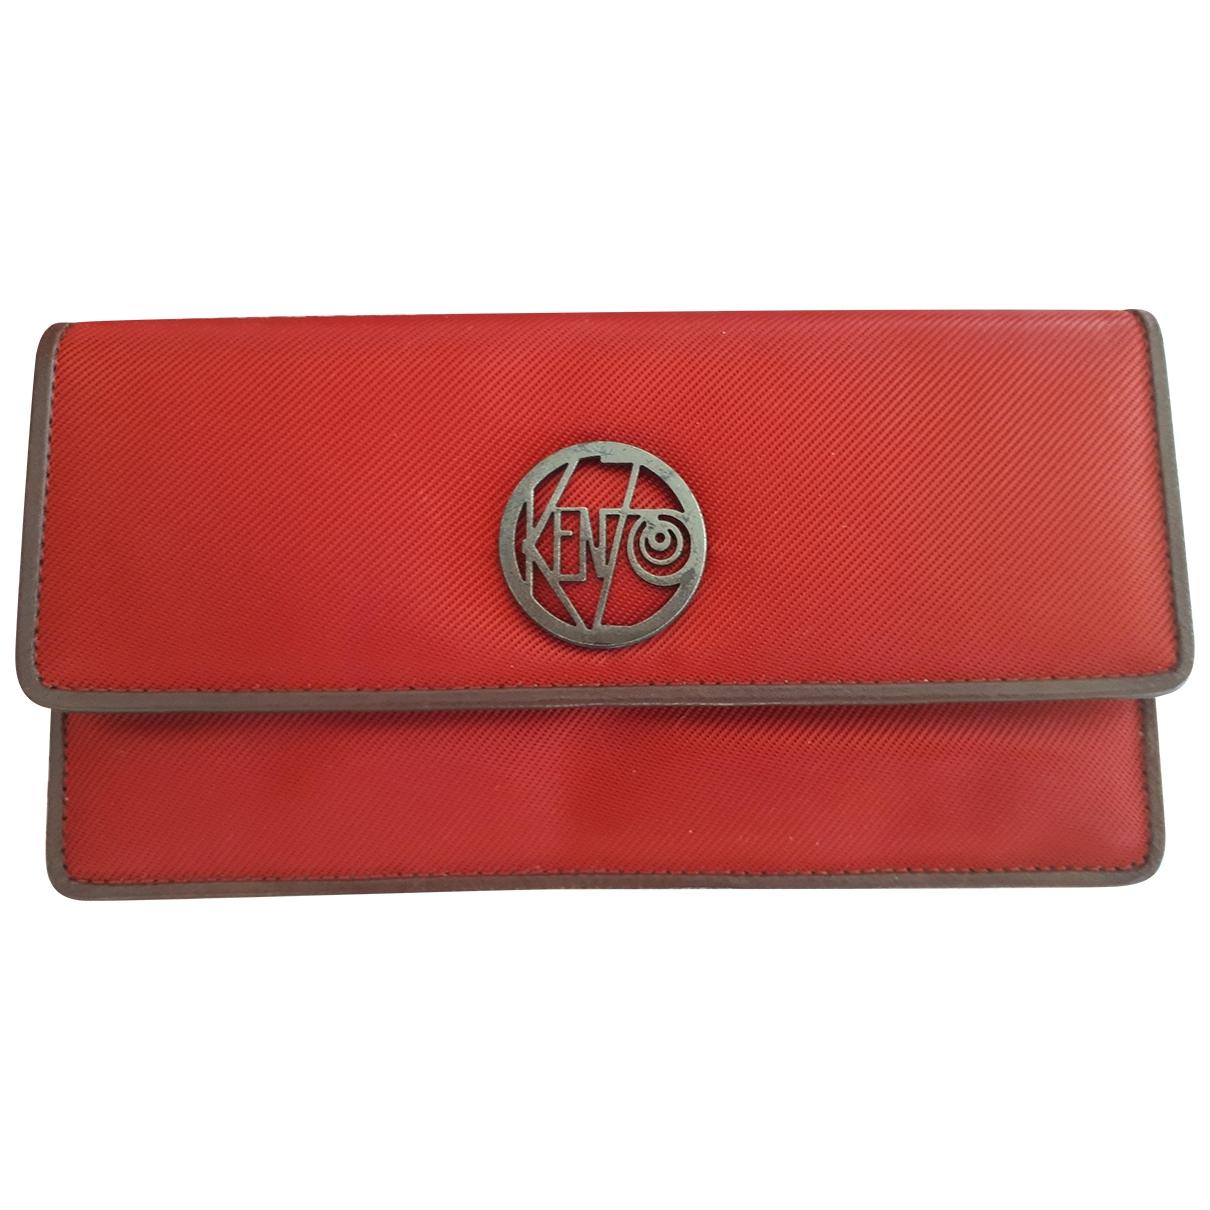 Kenzo \N Portemonnaie in  Rot Leinen